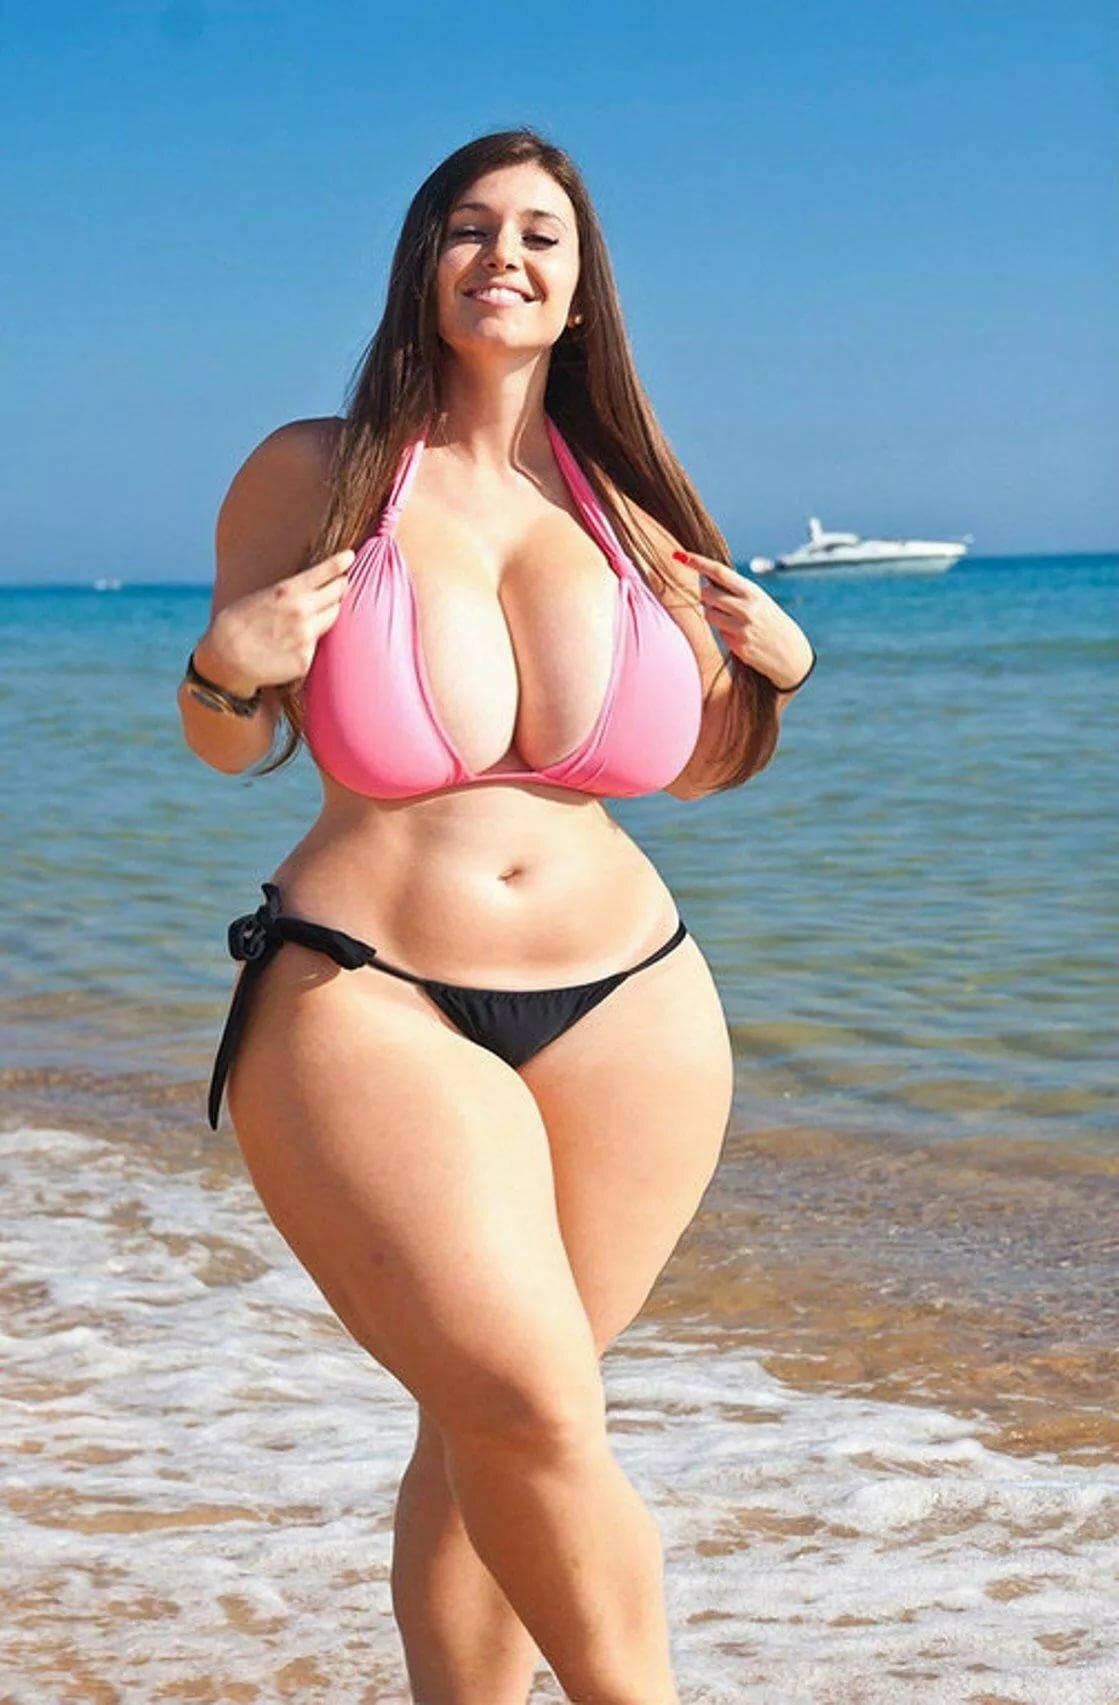 Огромная Голая Толстая Женщина